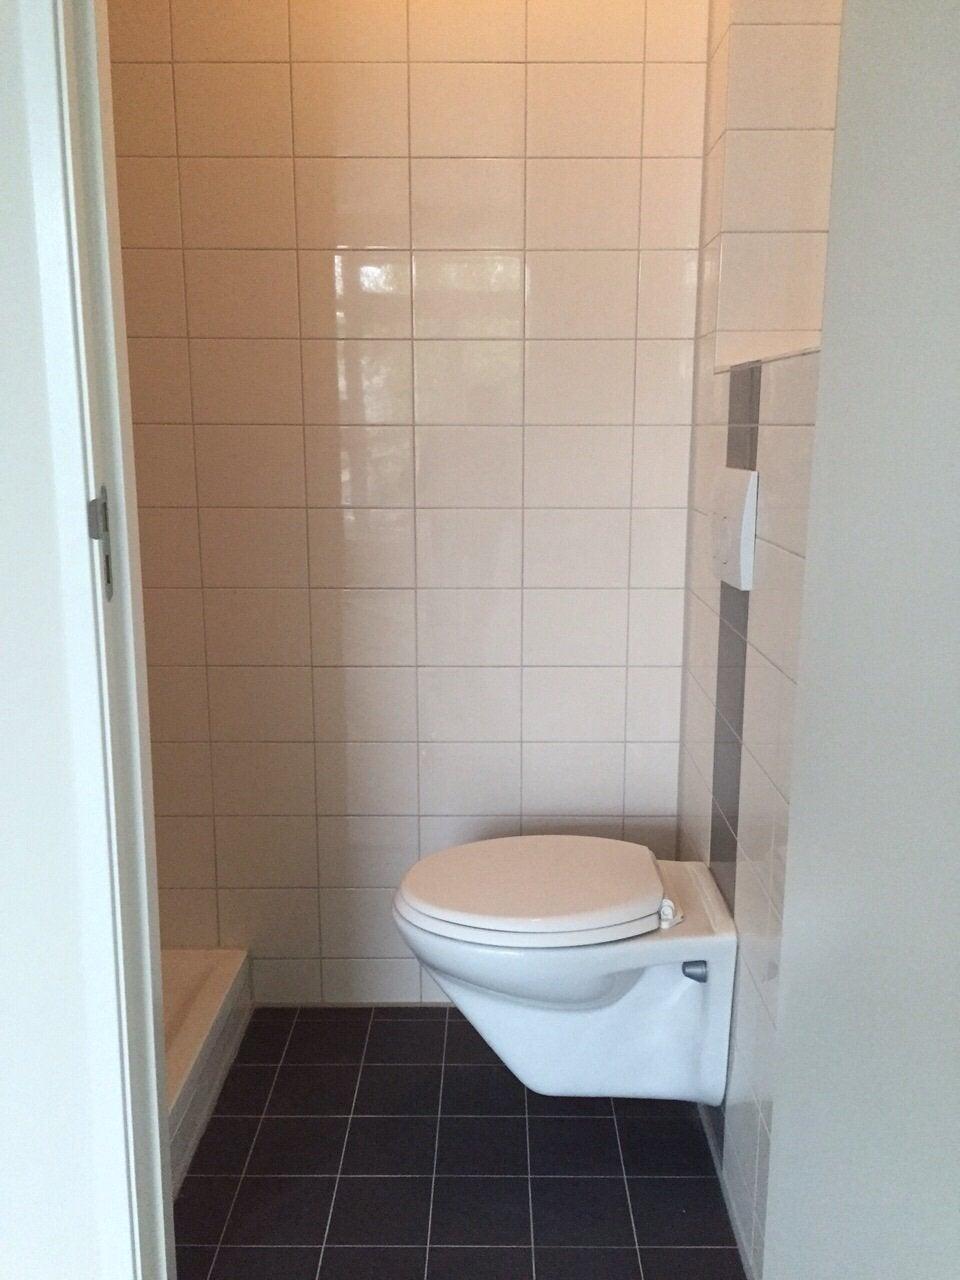 https://public.parariusoffice.nl/298/photos/huge/204.1431935968-573.jpeg